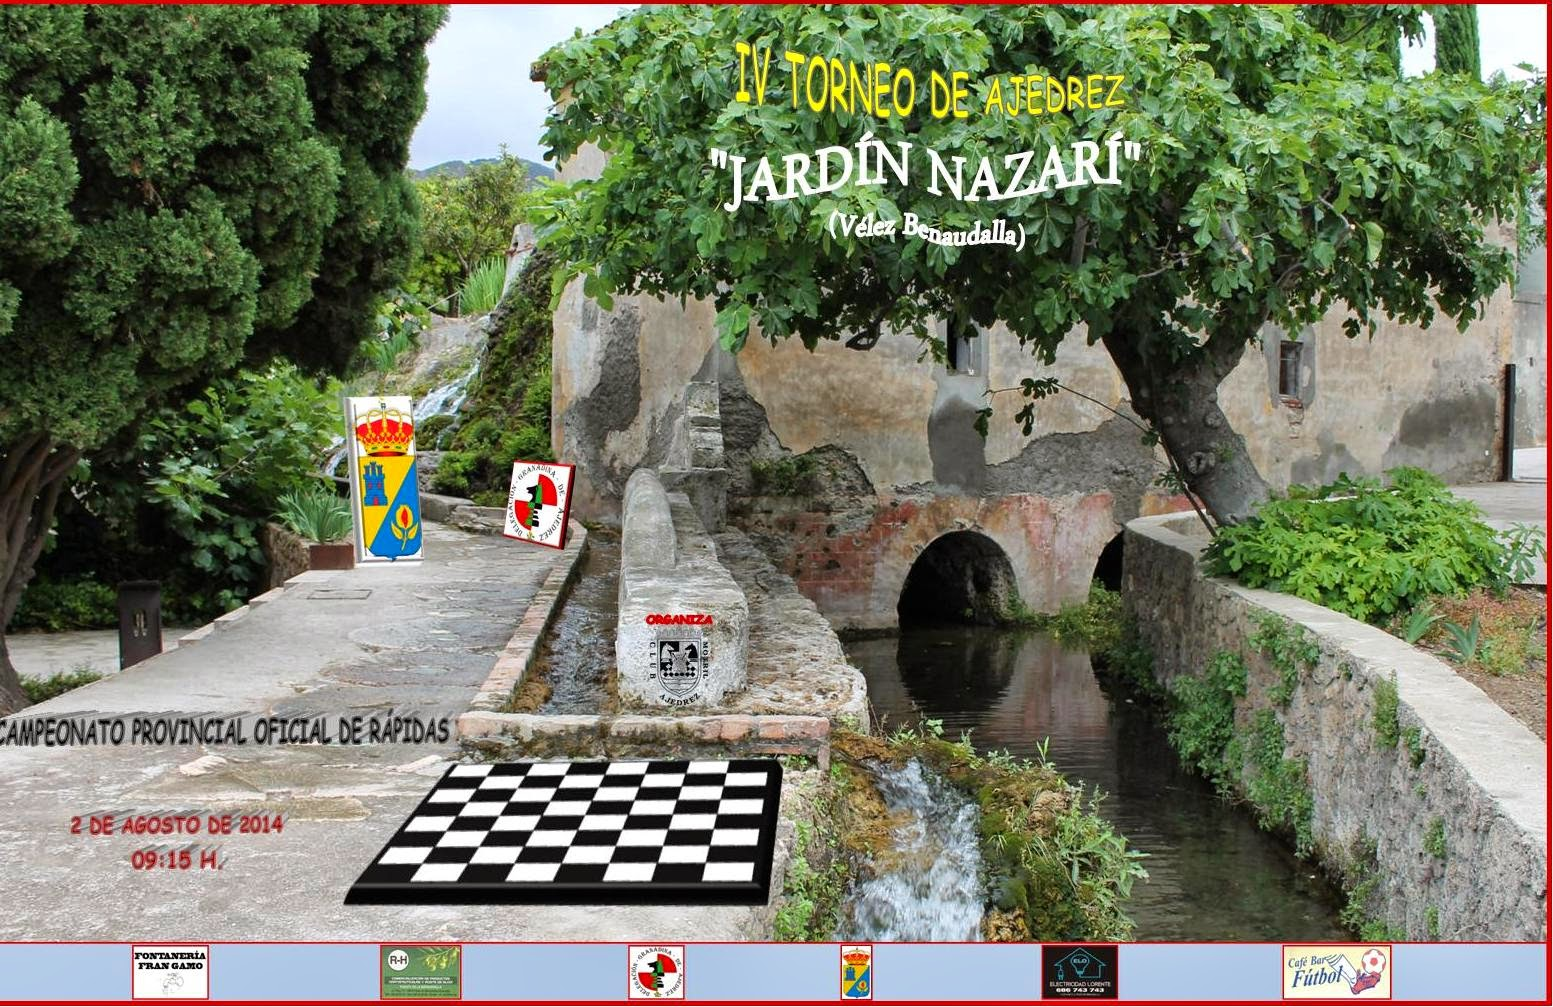 Ajedrez motril iv torneo de ajedrez jard n nazar for Ajedrea de jardin